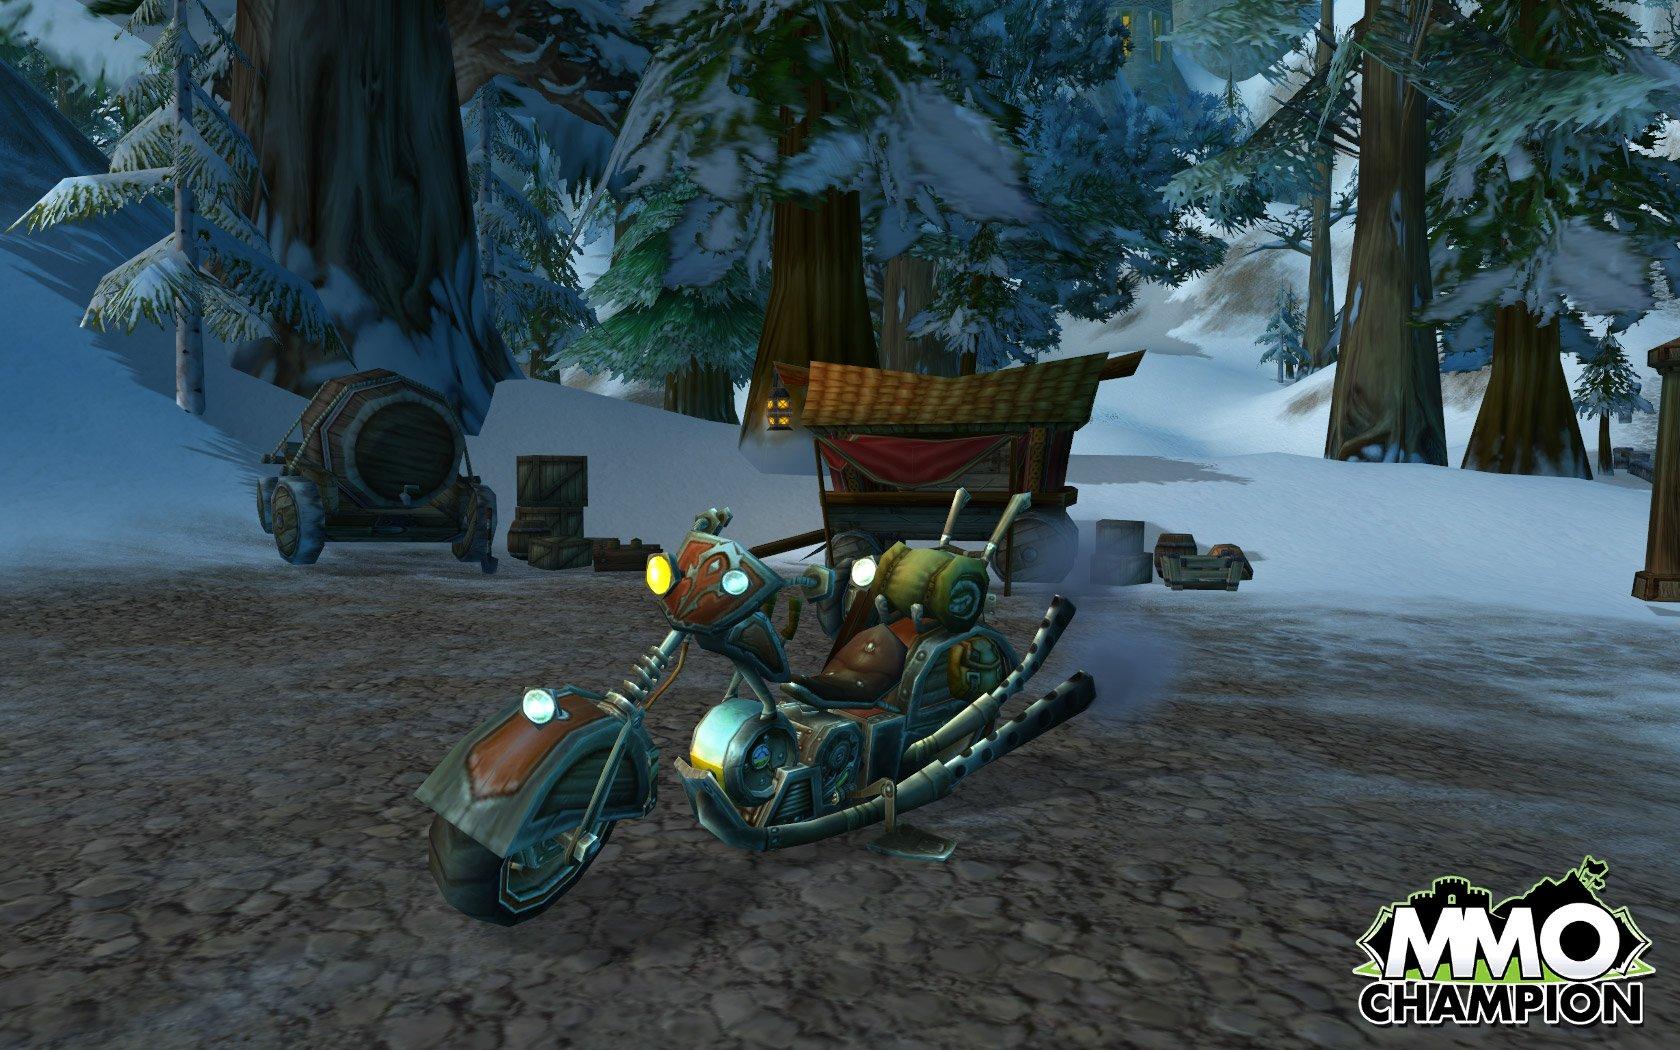 Mechano Hog Chopper Mechano Hog h